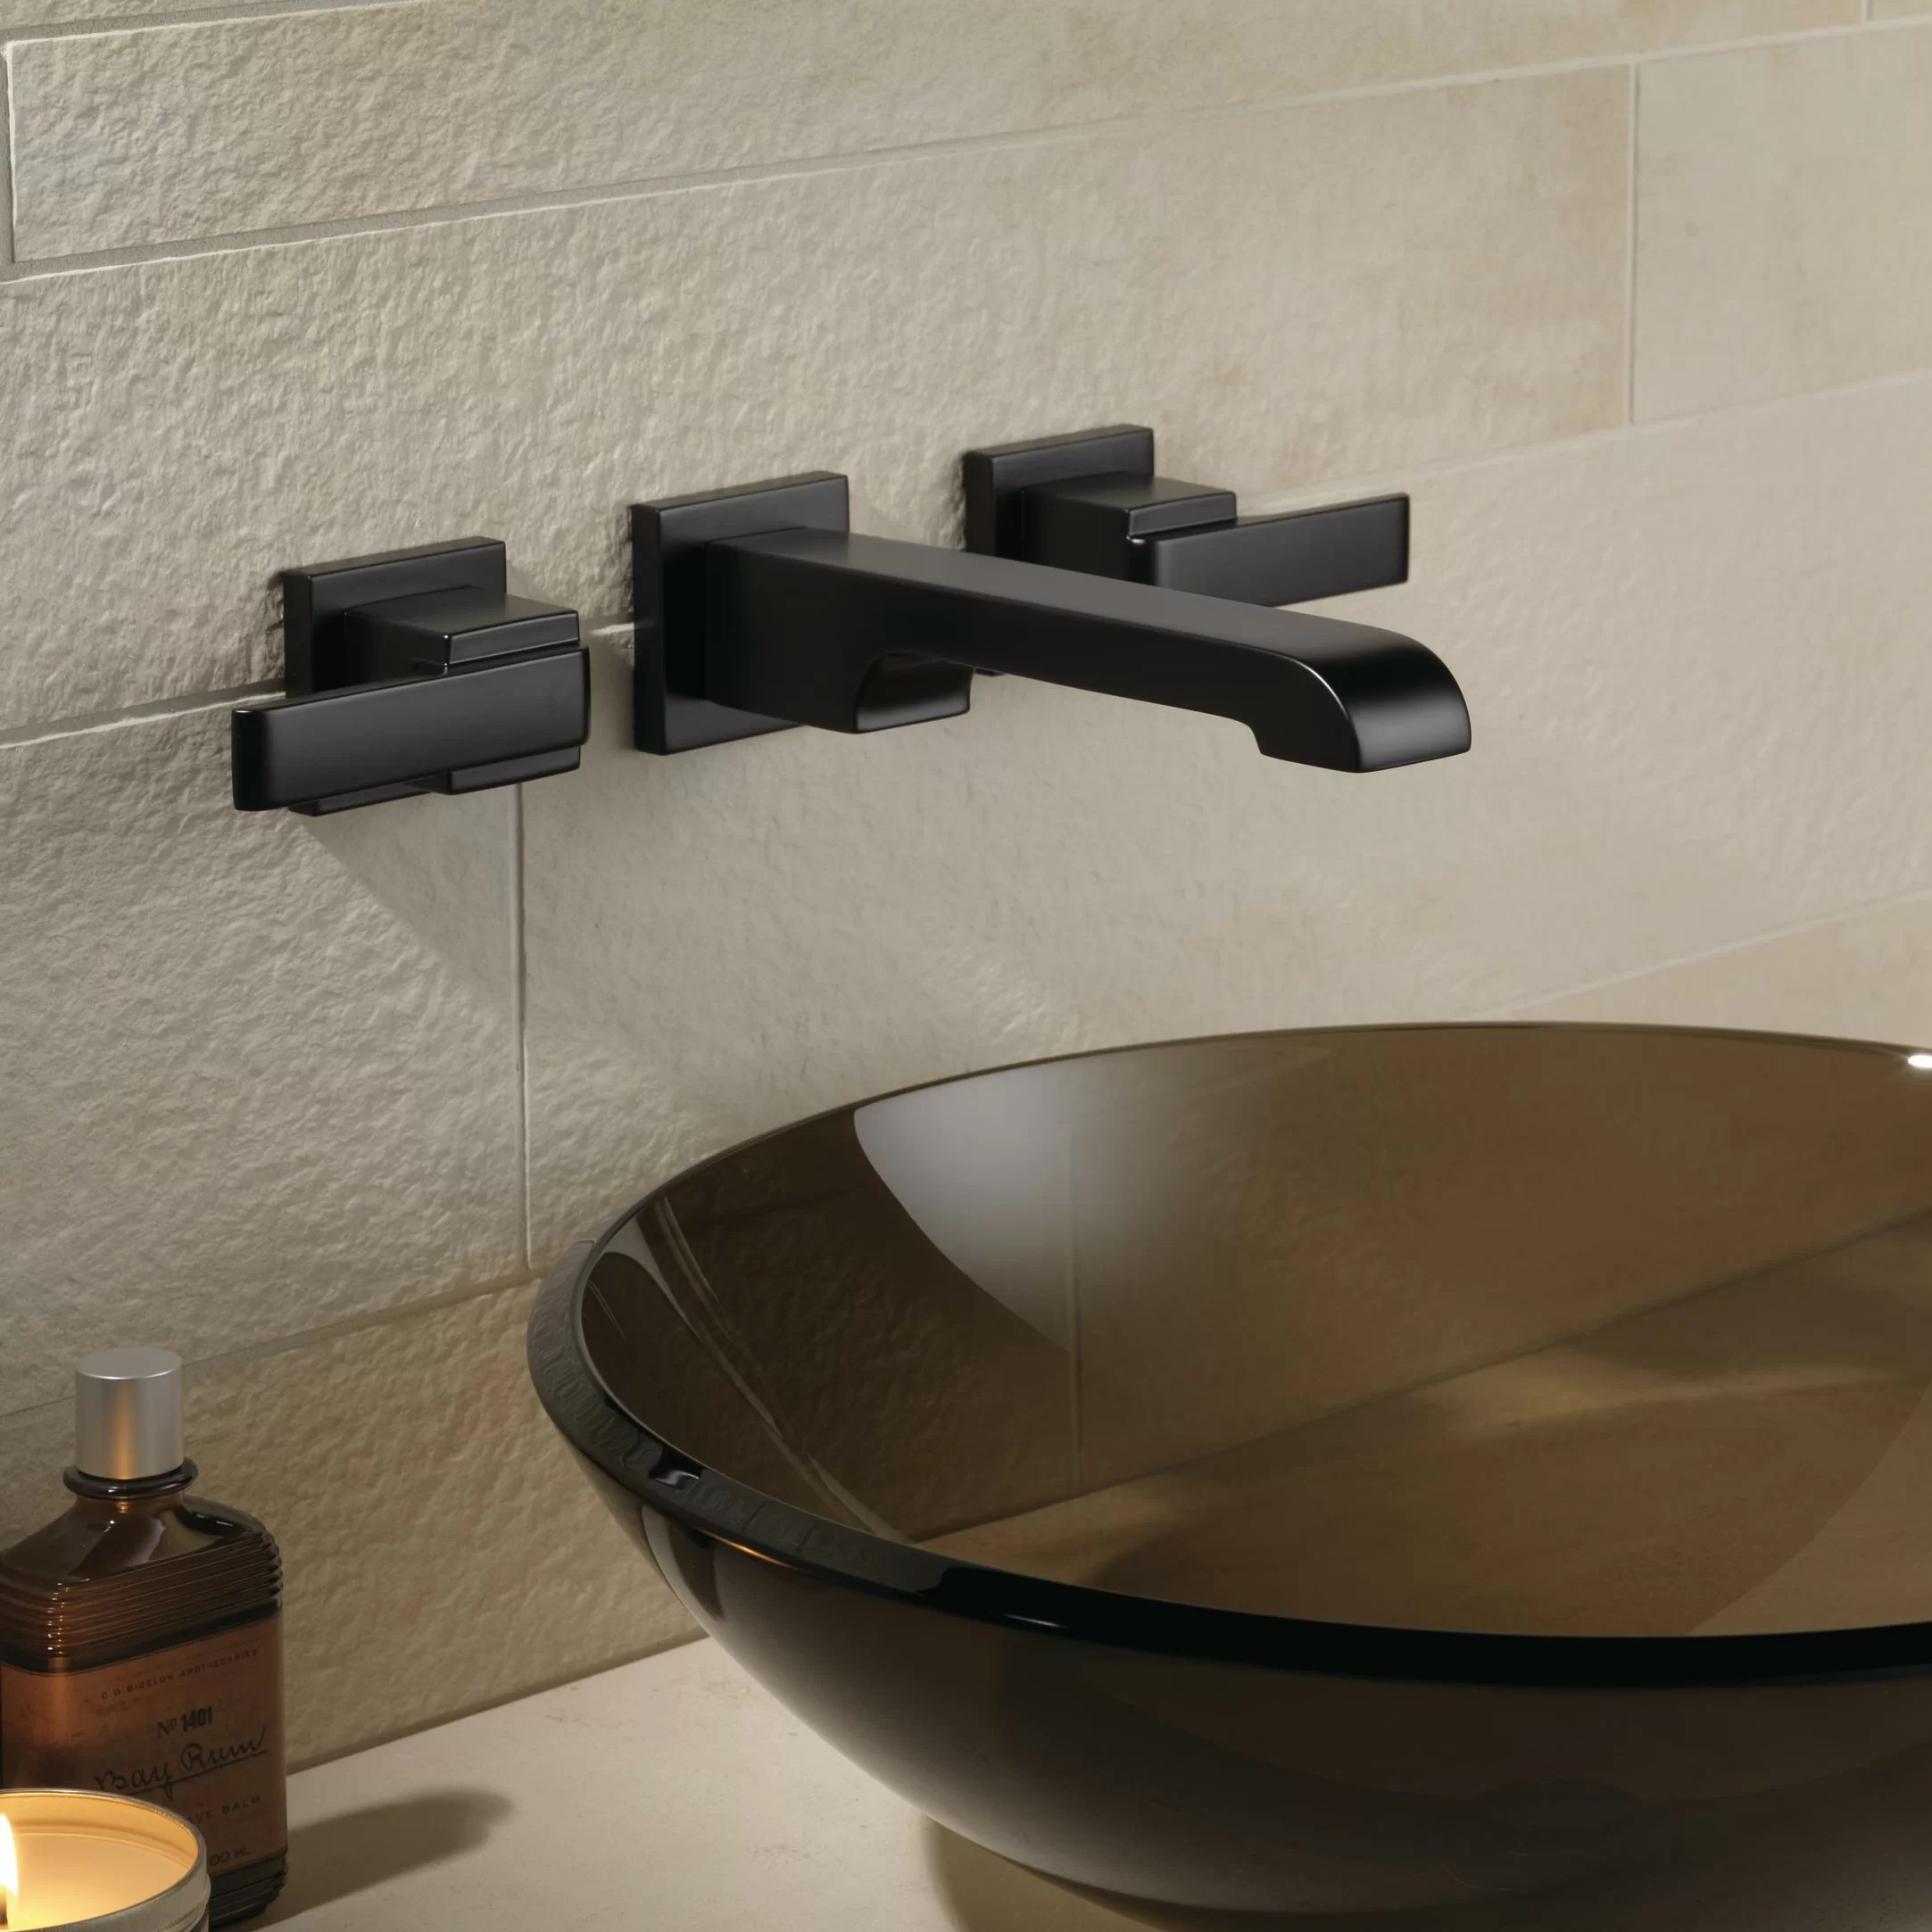 chrome delta faucet t3568lf wl ara two handle wall mount waterfall bathroom faucet mimbarschool com ng